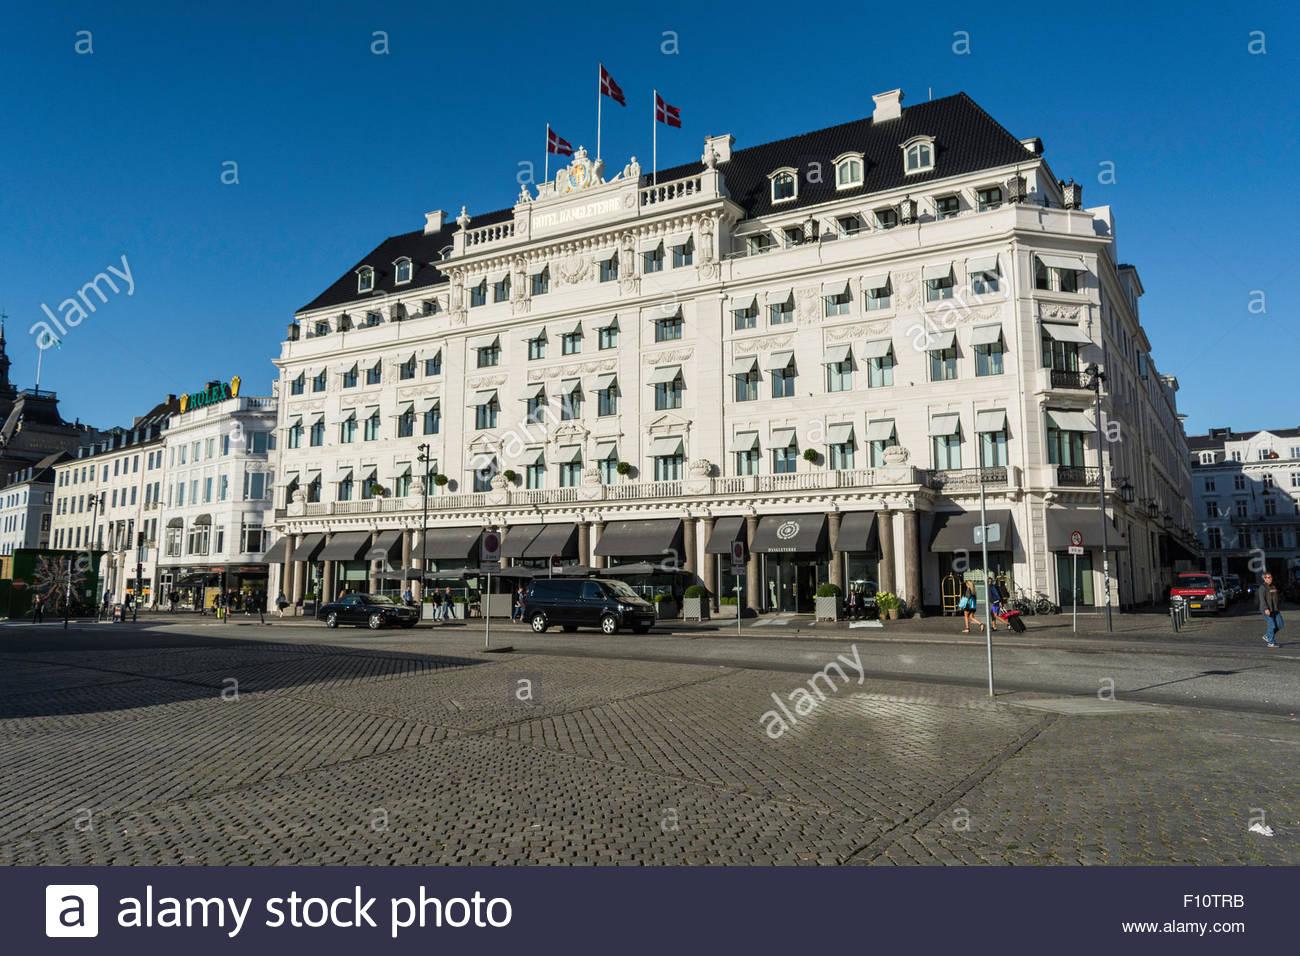 Hotel d'Angleterre, Kongens Nytorv, Copenhagen, Hovedstaden Region, Denmark, EU - Stock Image